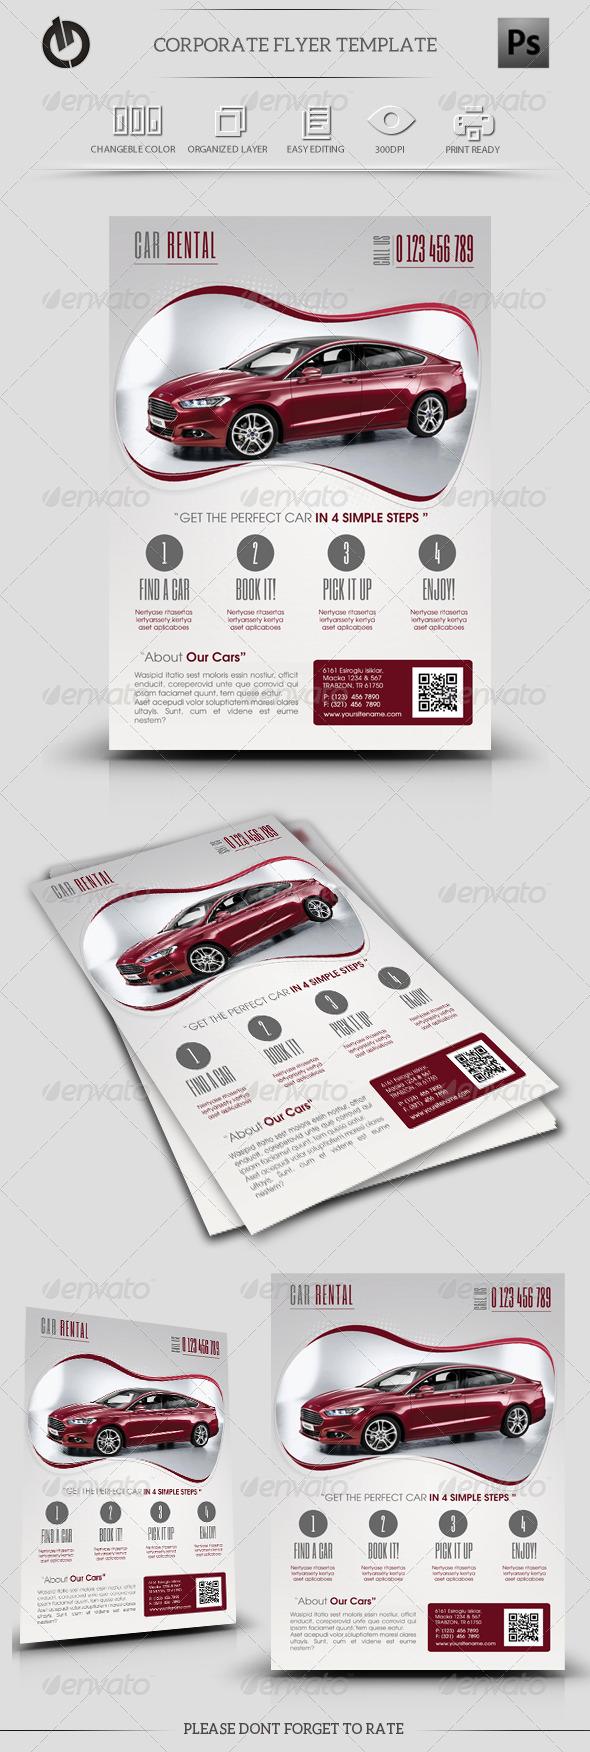 GraphicRiver Car Rental Flyer Template 5741529